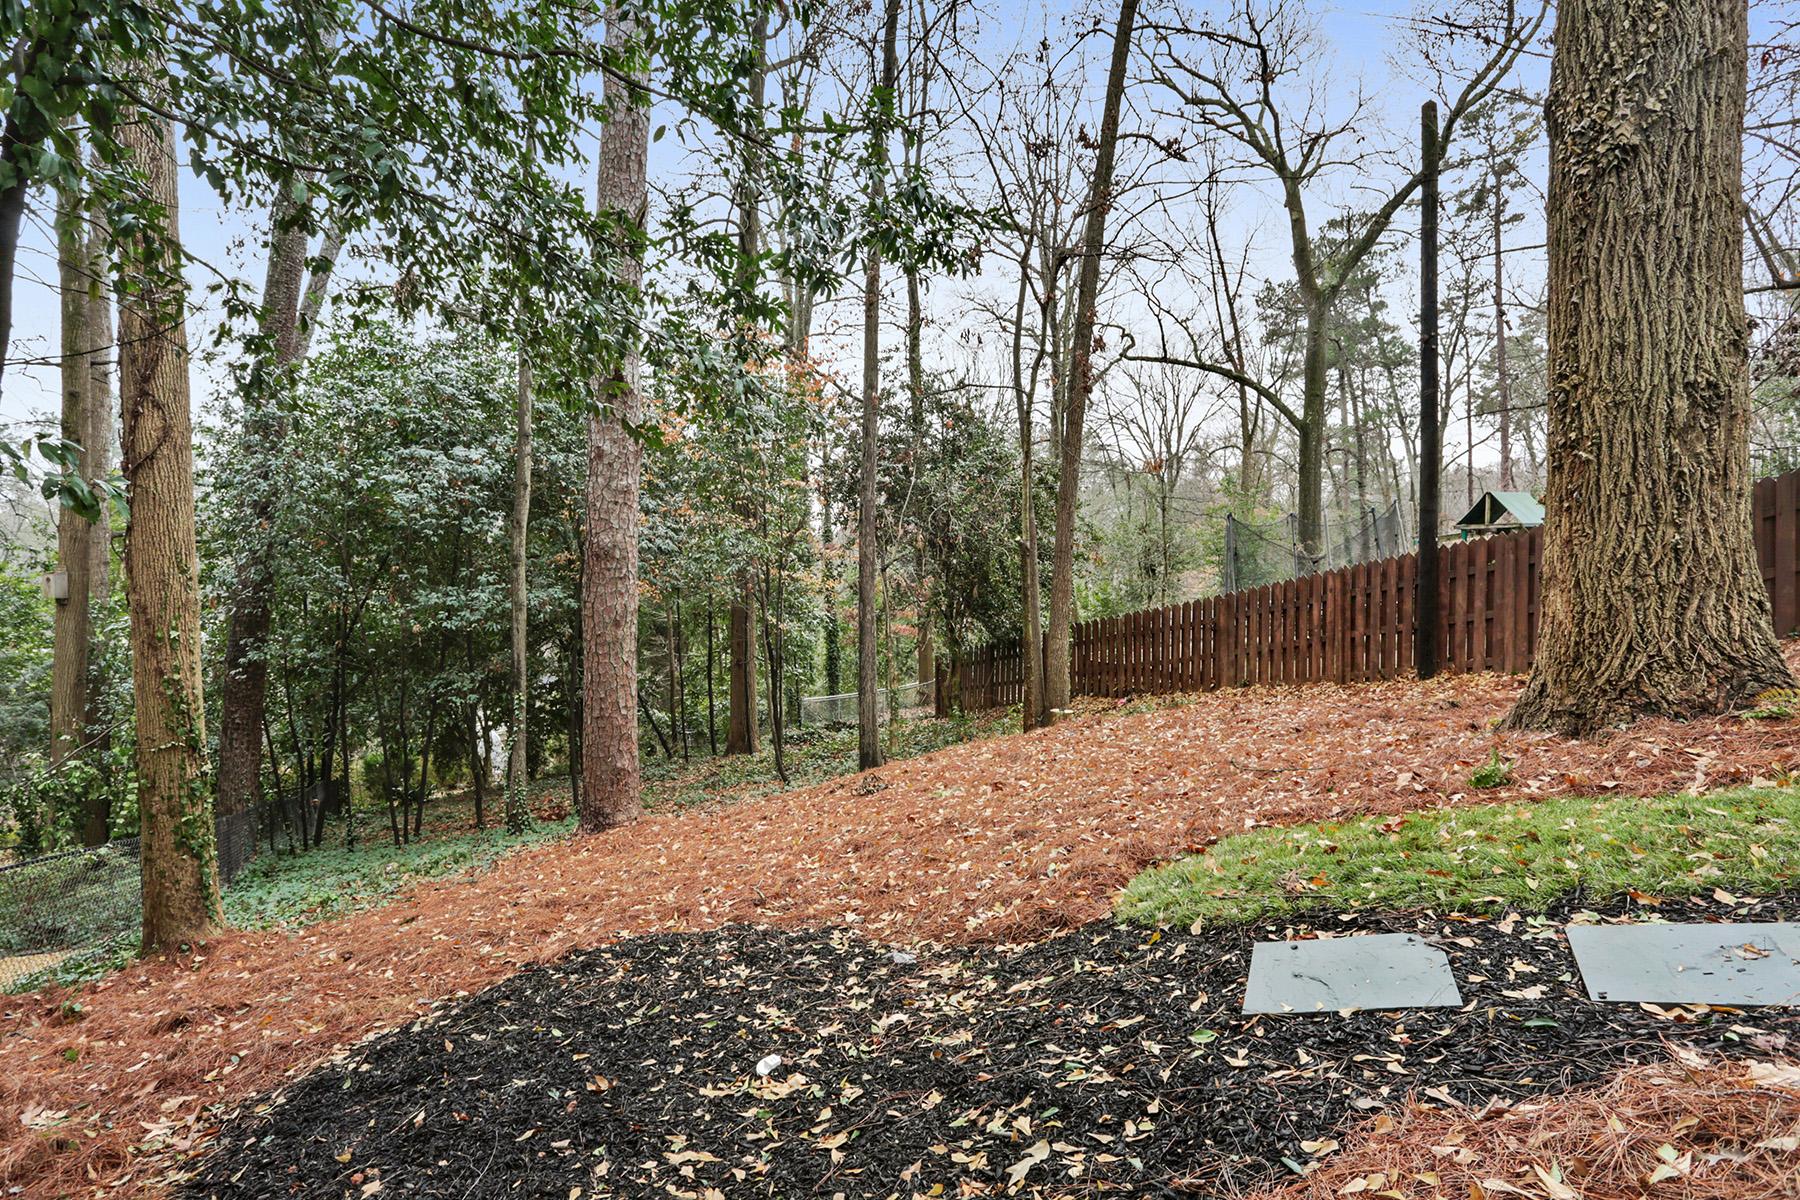 Additional photo for property listing at New Construction in Buckhead  - Morris Brandon Elementary 2155 McKinley Rd Atlanta, Georgien 30318 Usa